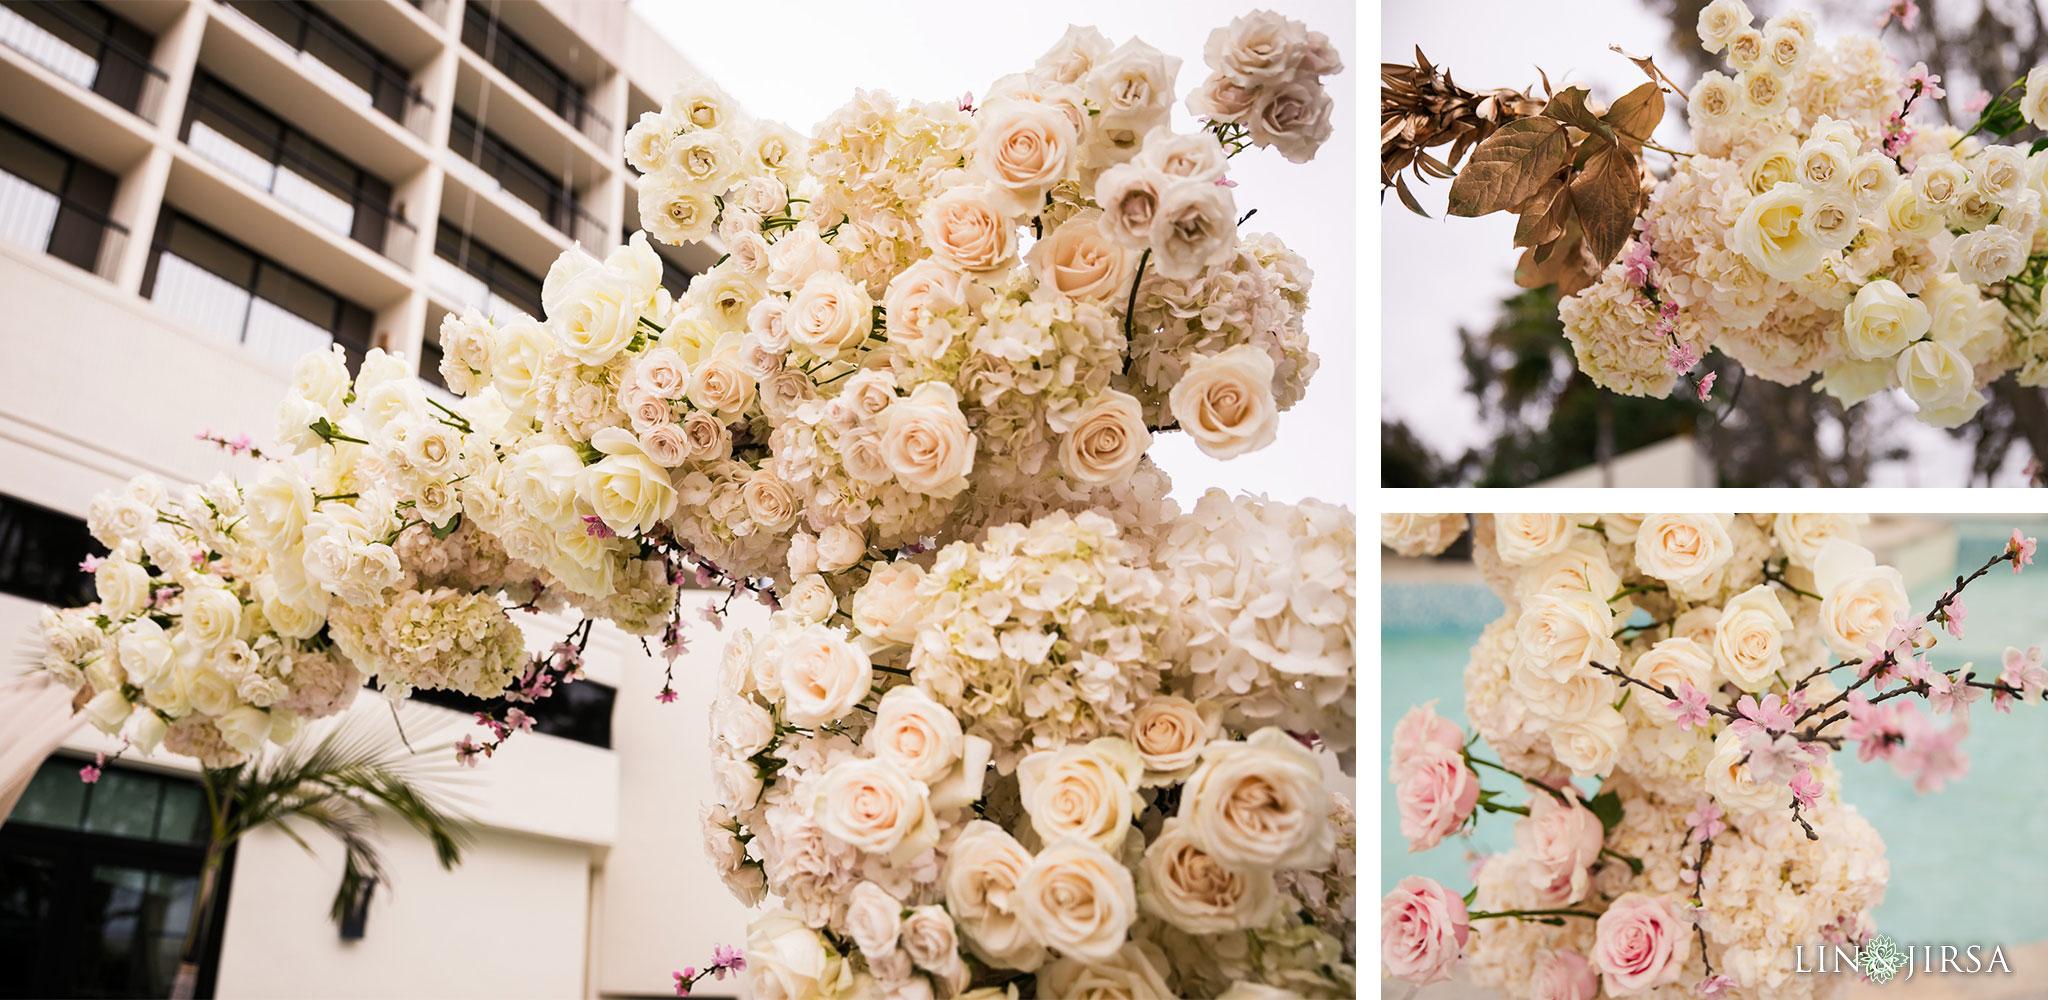 023 hilton costa mesa orange county vietnamese wedding photography